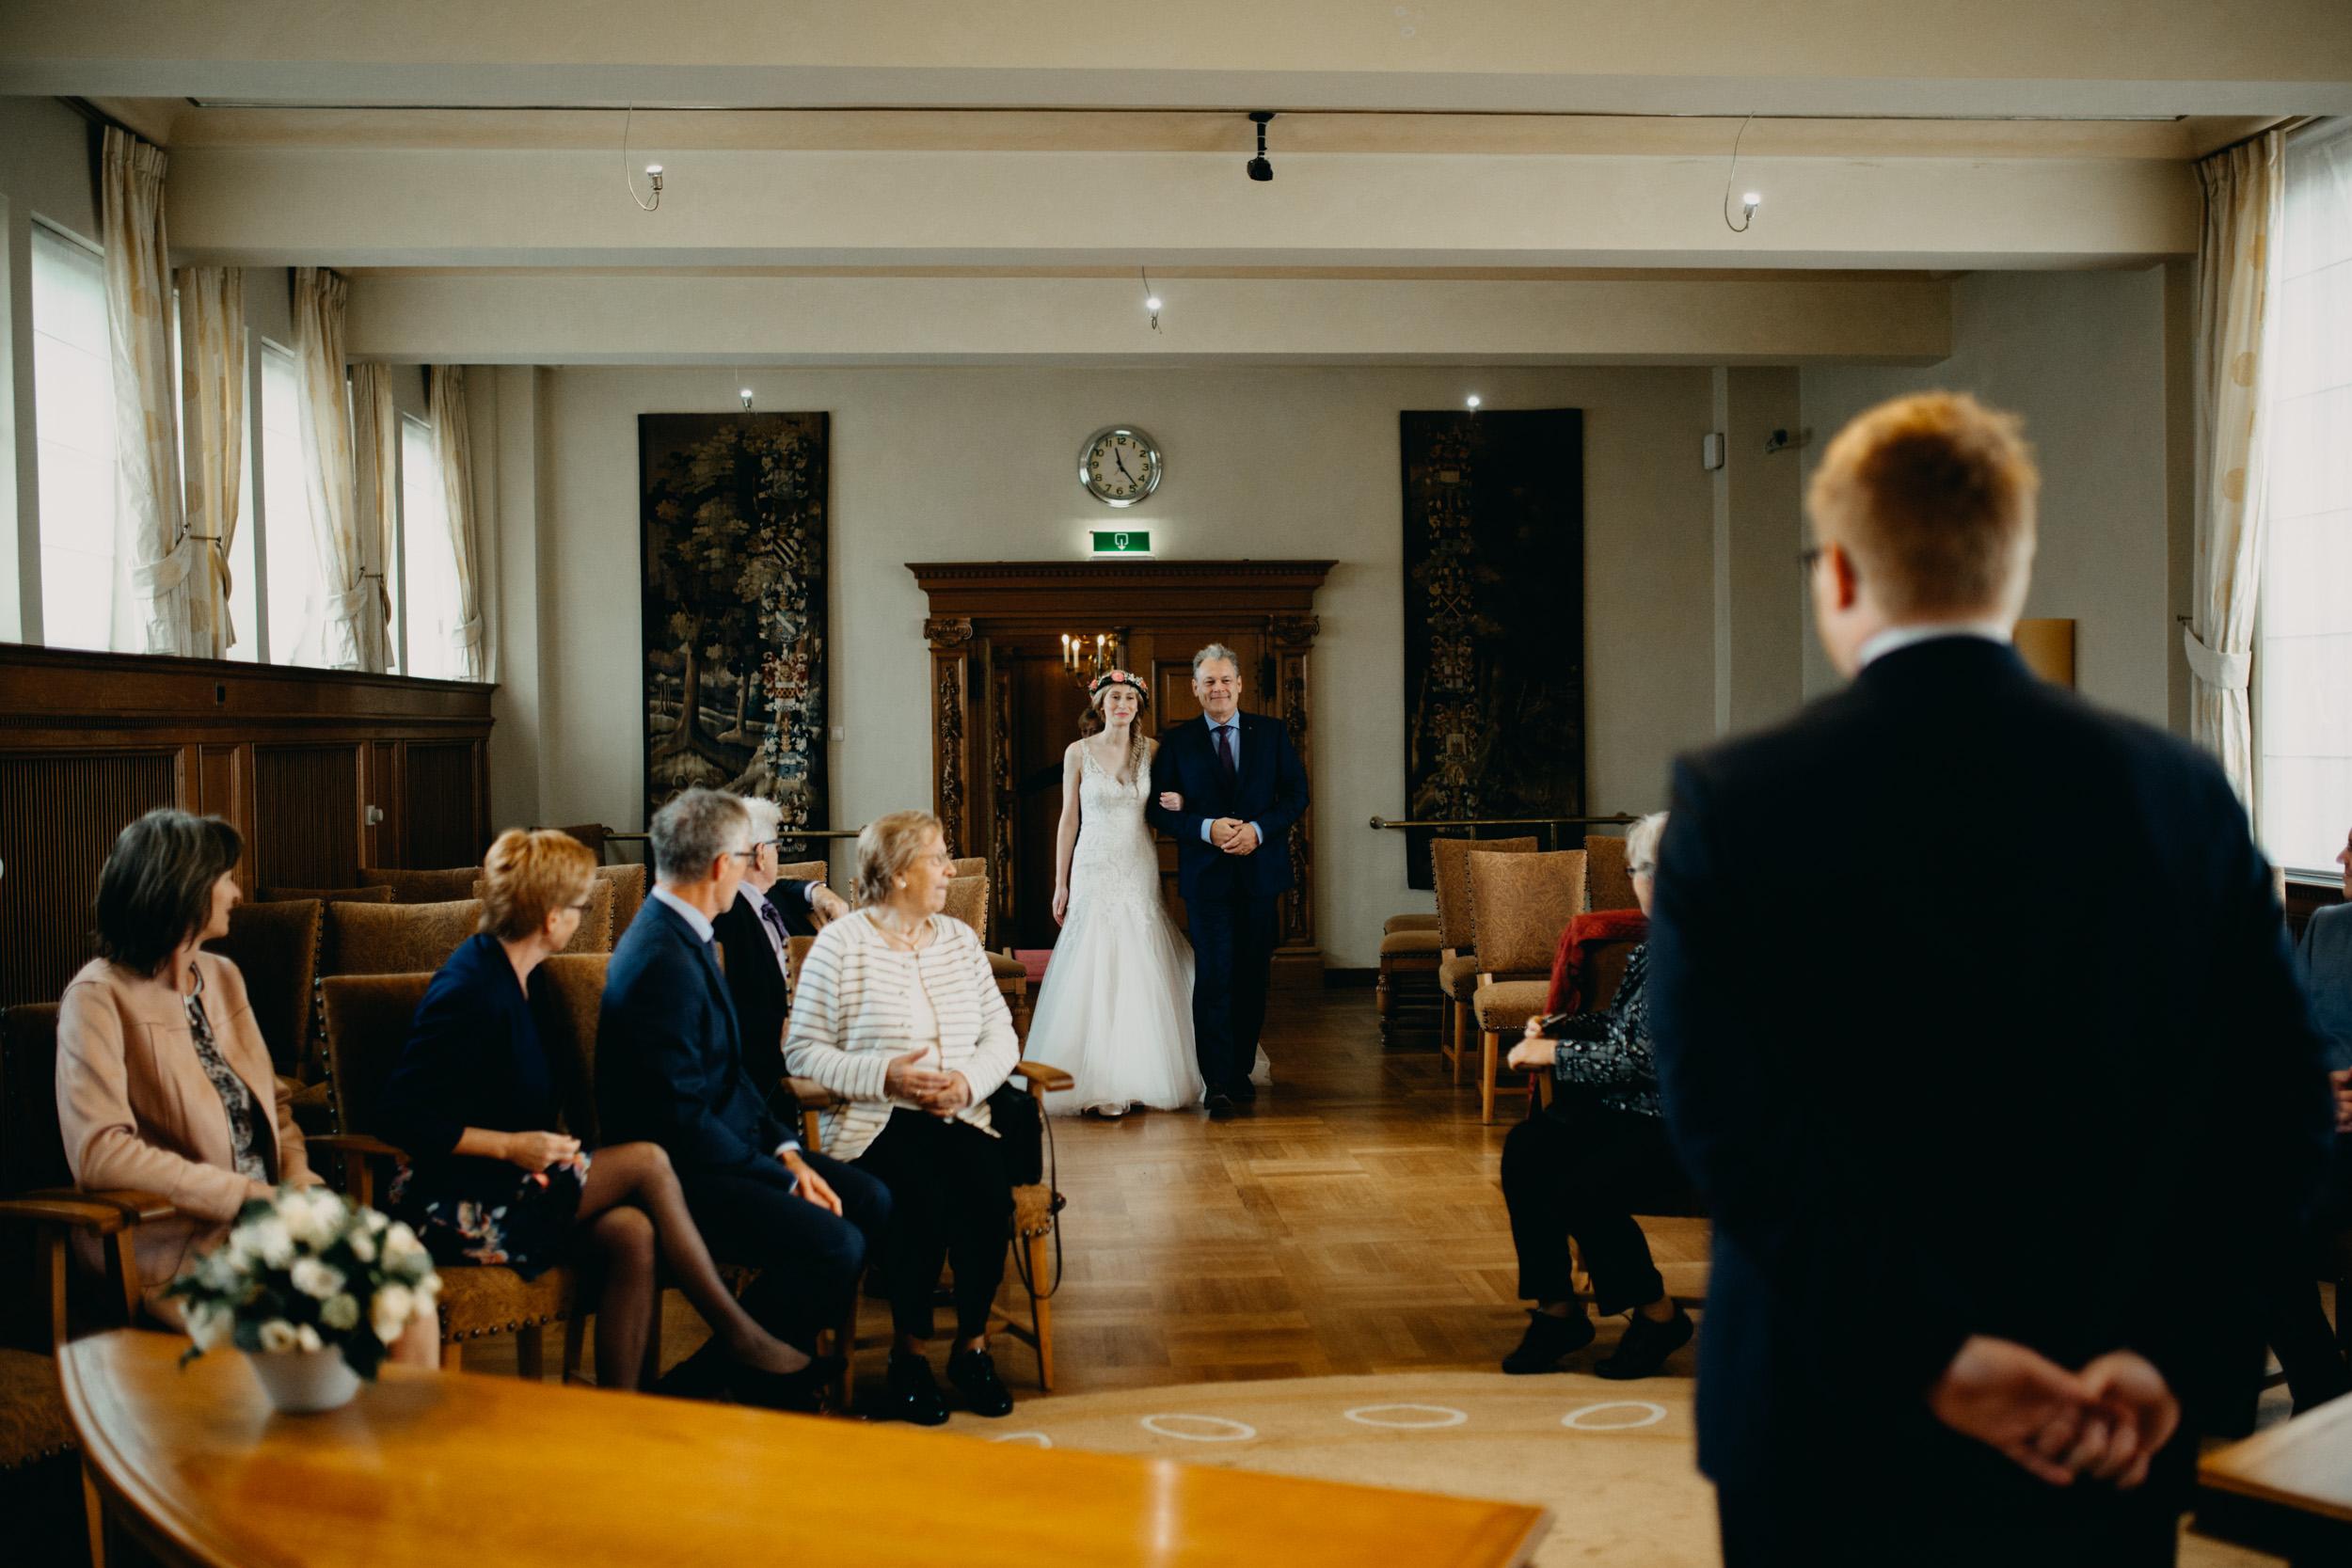 stadhuis-nijmegen-trouwzaal-trouwfotografie